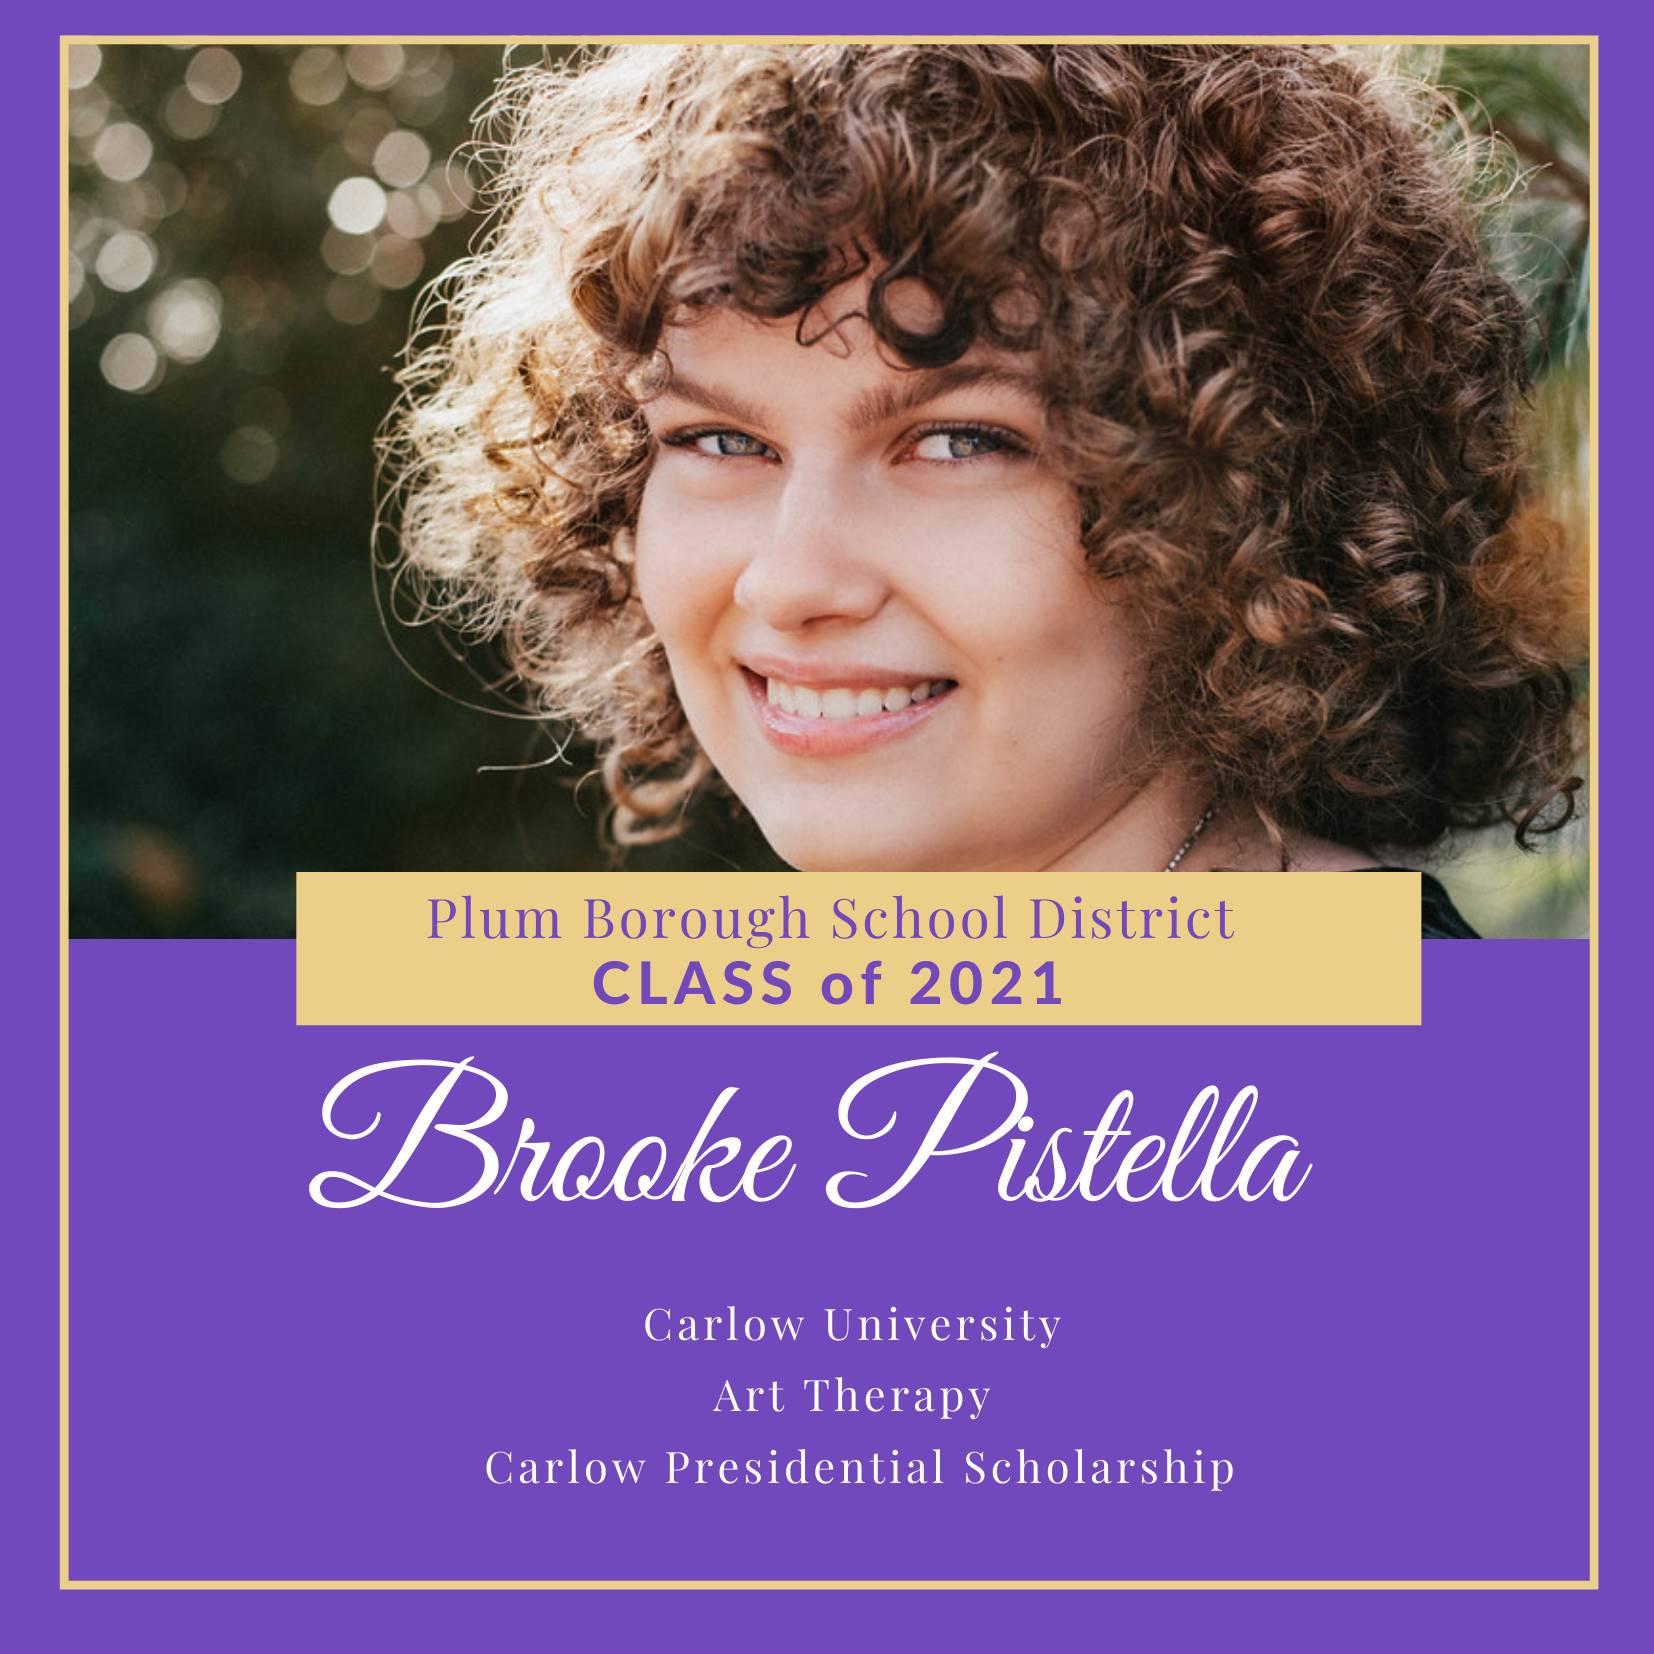 Congratulations to Brooke Pistella, Class of 2021!